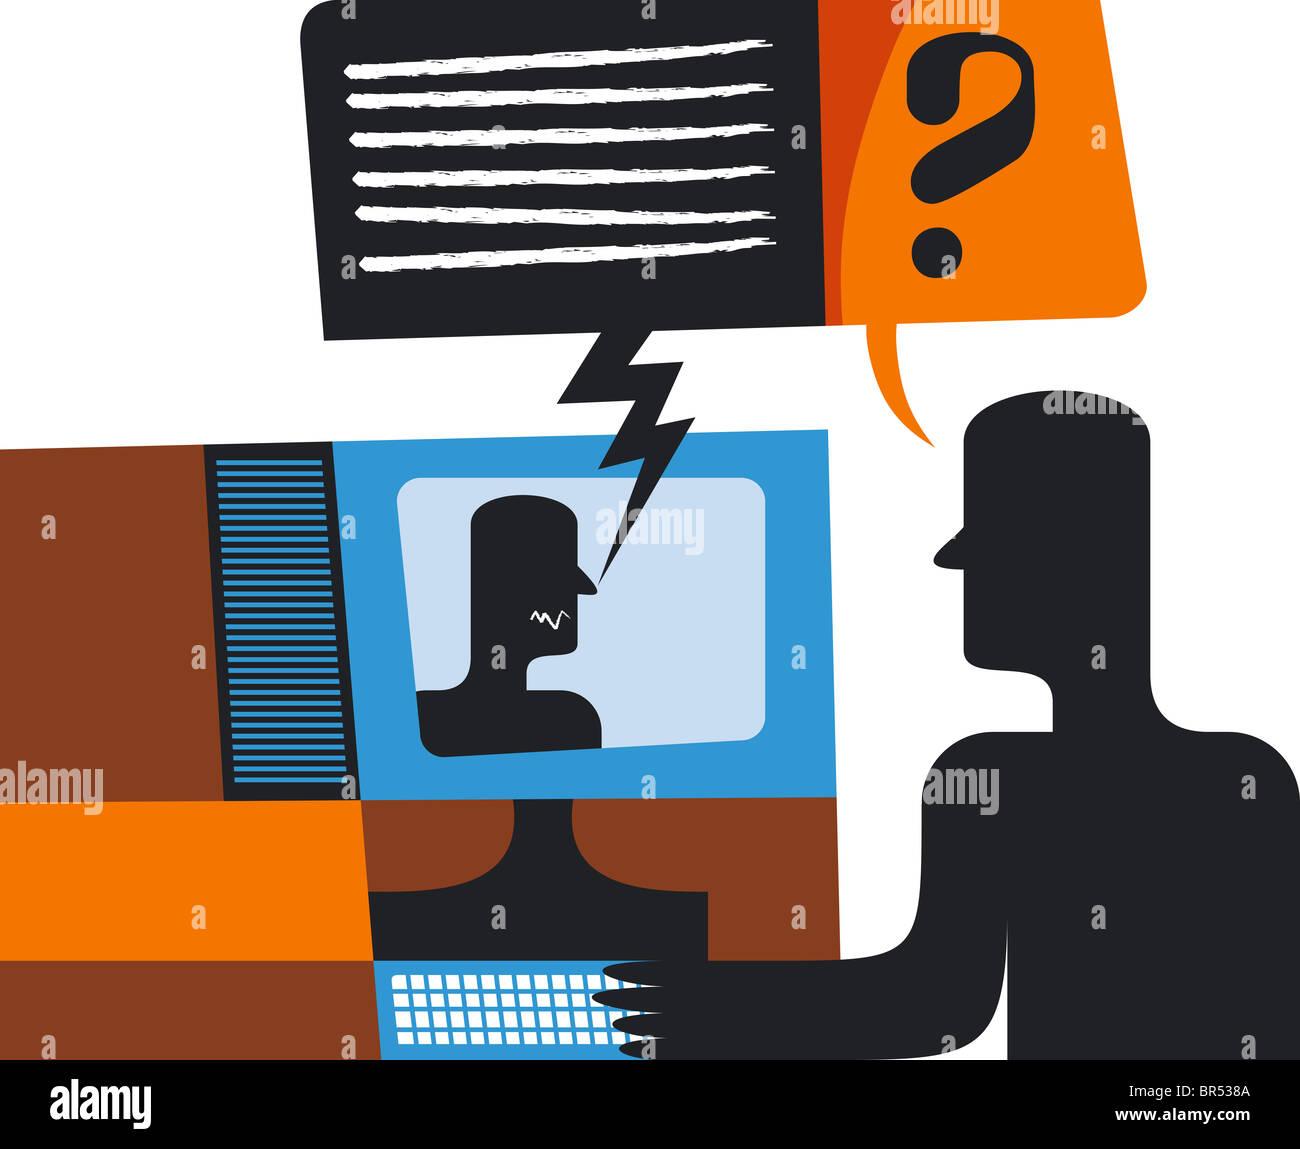 Miscommunication over the internet - Stock Image